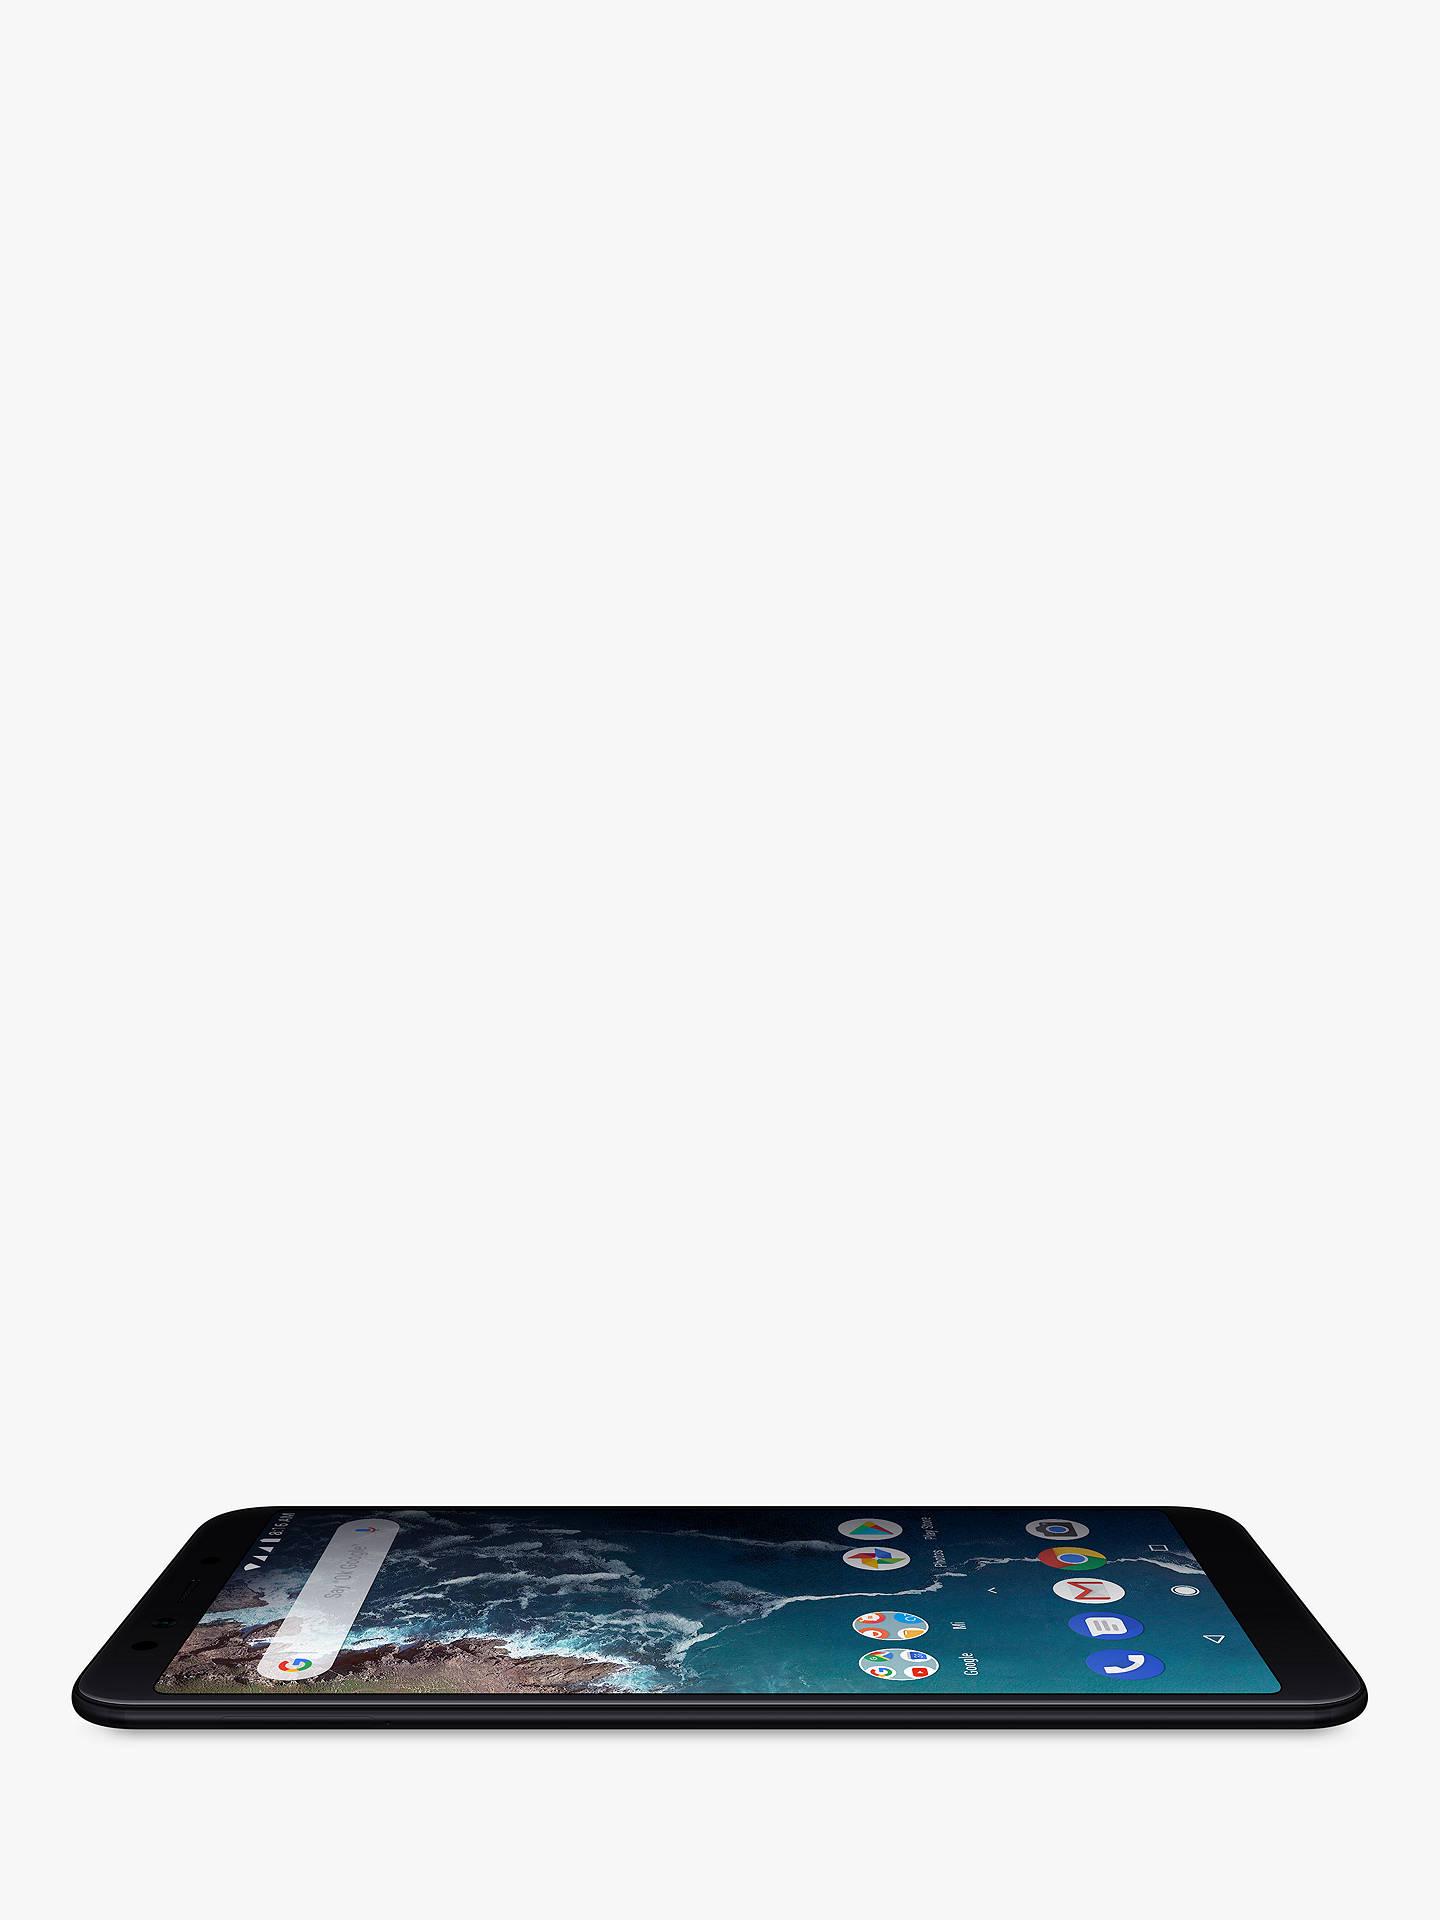 "Xiaomi Mi A2 Dual SIM Smartphone, Android, 5 99"", 4G LTE, SIM Free, 64GB,  Black"